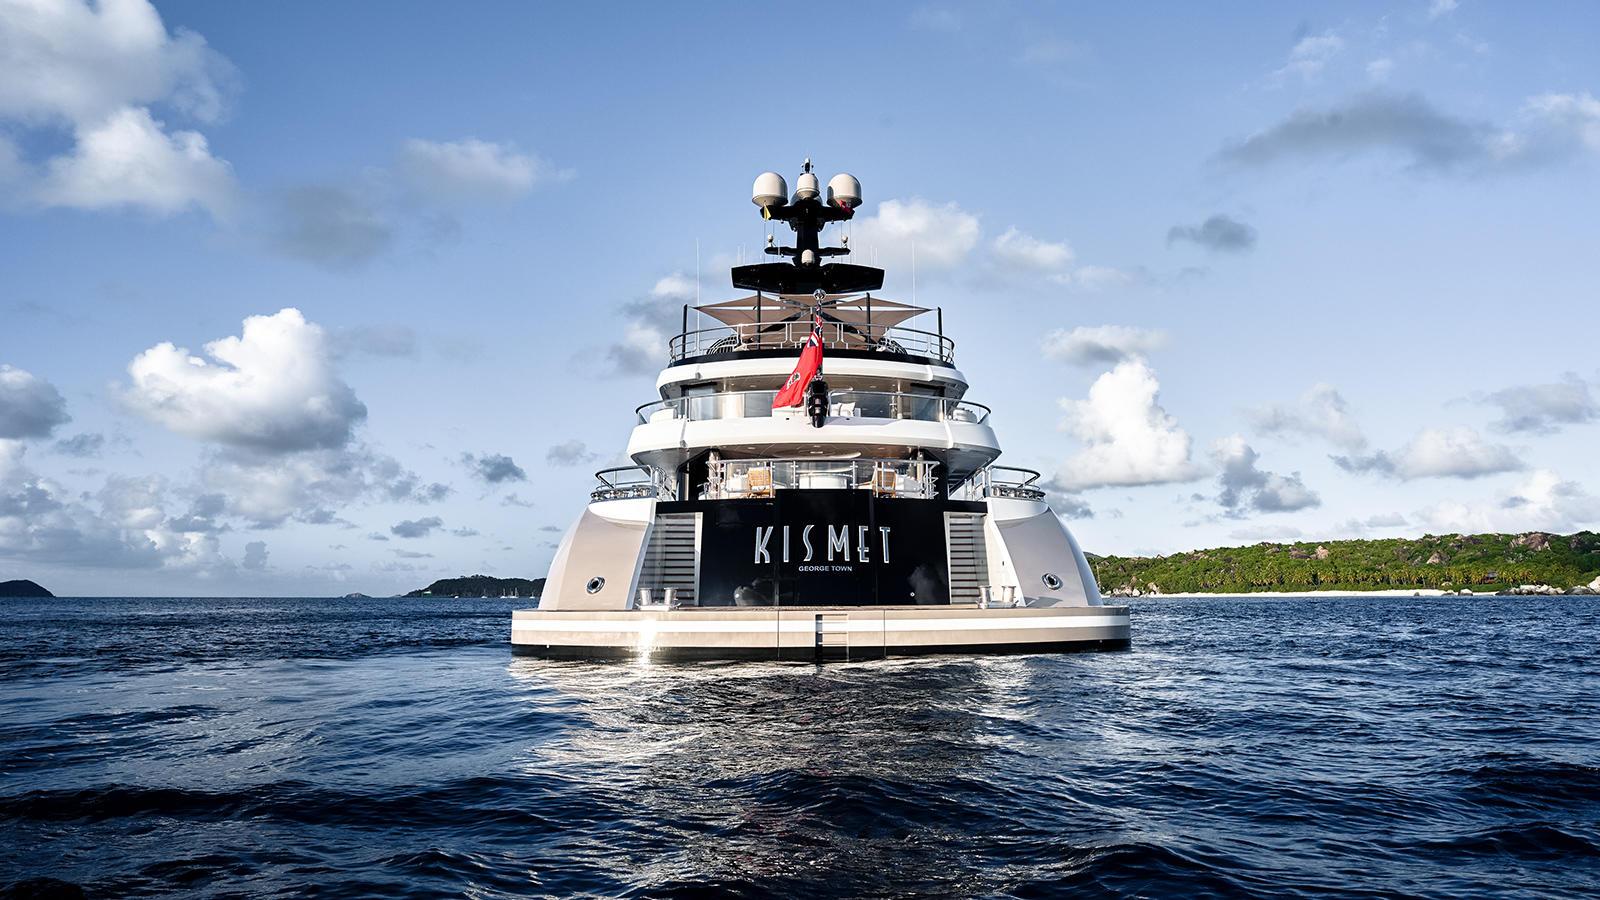 YG4jBk84SRCdZSmS3DhI_Kismet-super-yacht-lurssen-shahid-khan-95-metres-credit-guillaume-plisson-aft-v